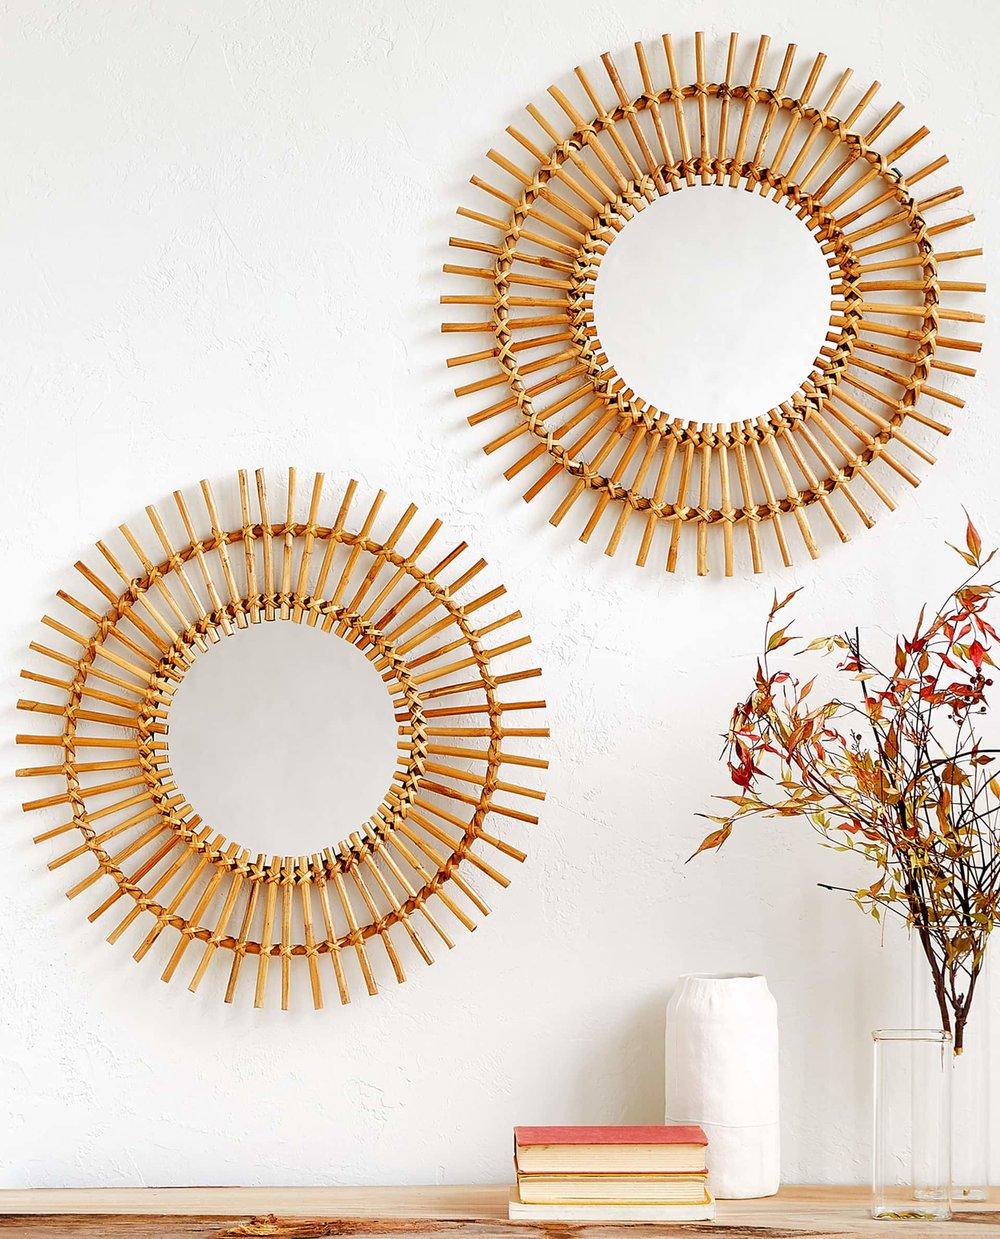 Round Bamboo Mirror from Zara Home, £69.99